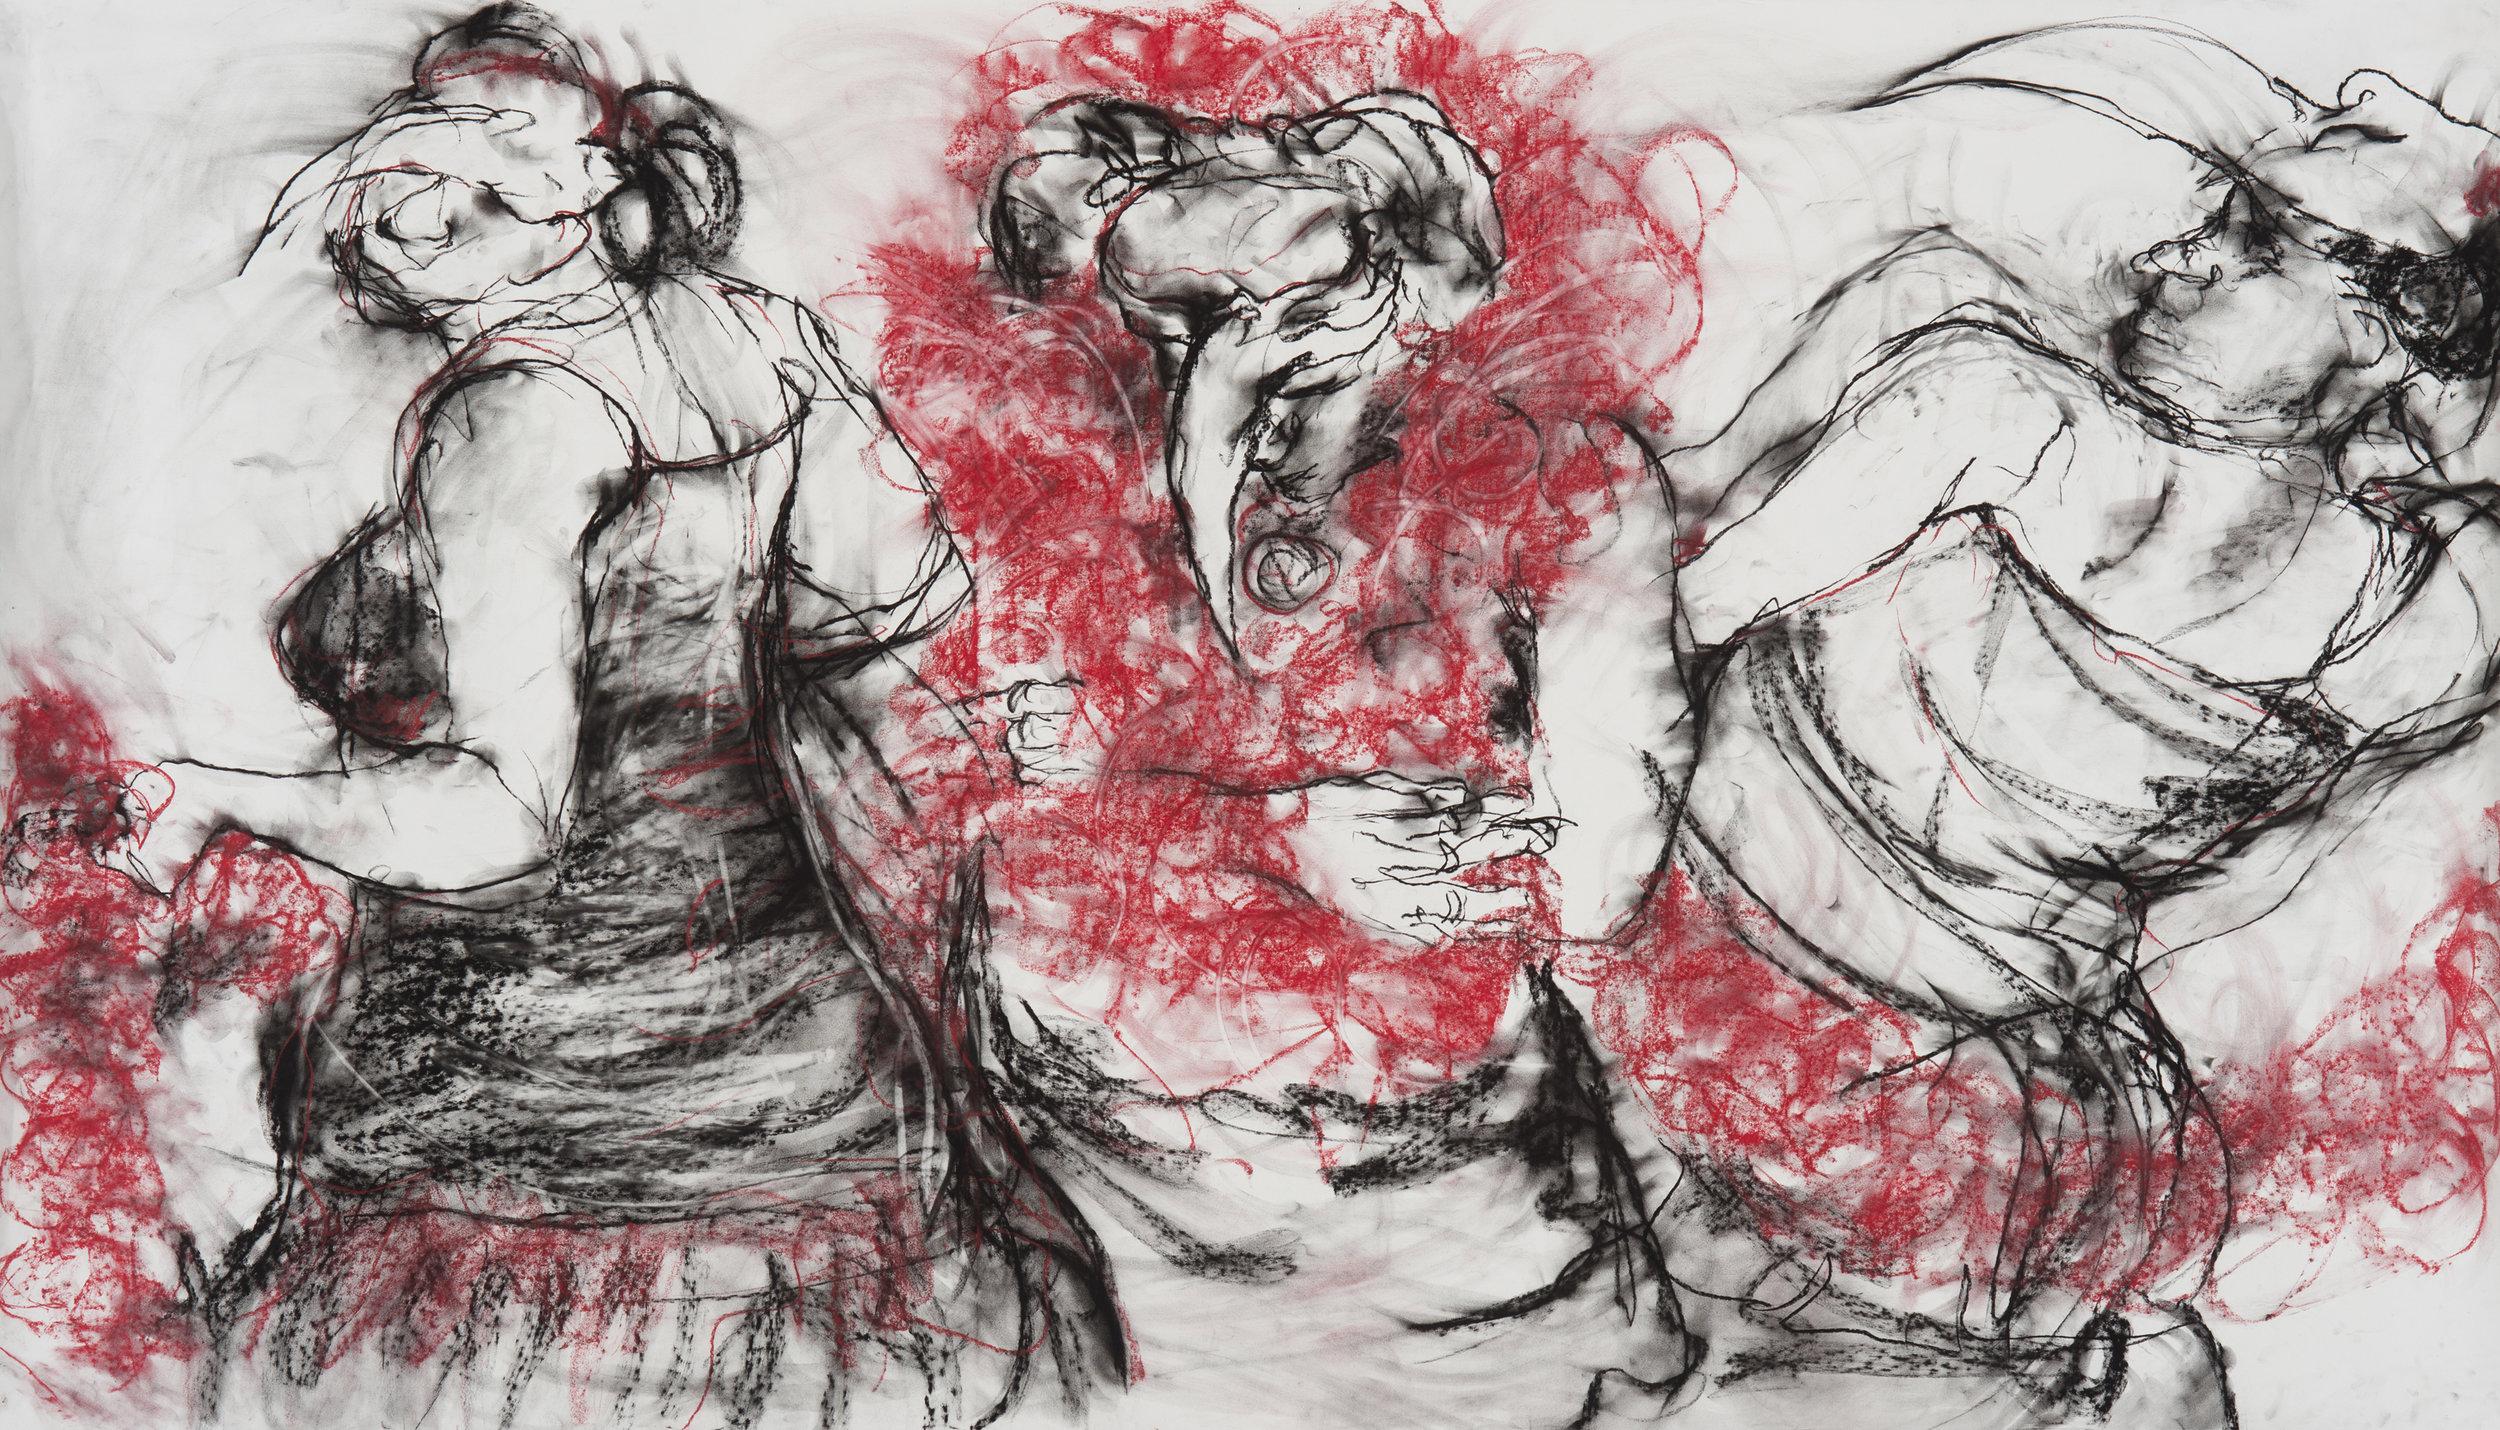 """Danza de los Muertos"" charcoal and pastel on paper, 42"" x 74"""